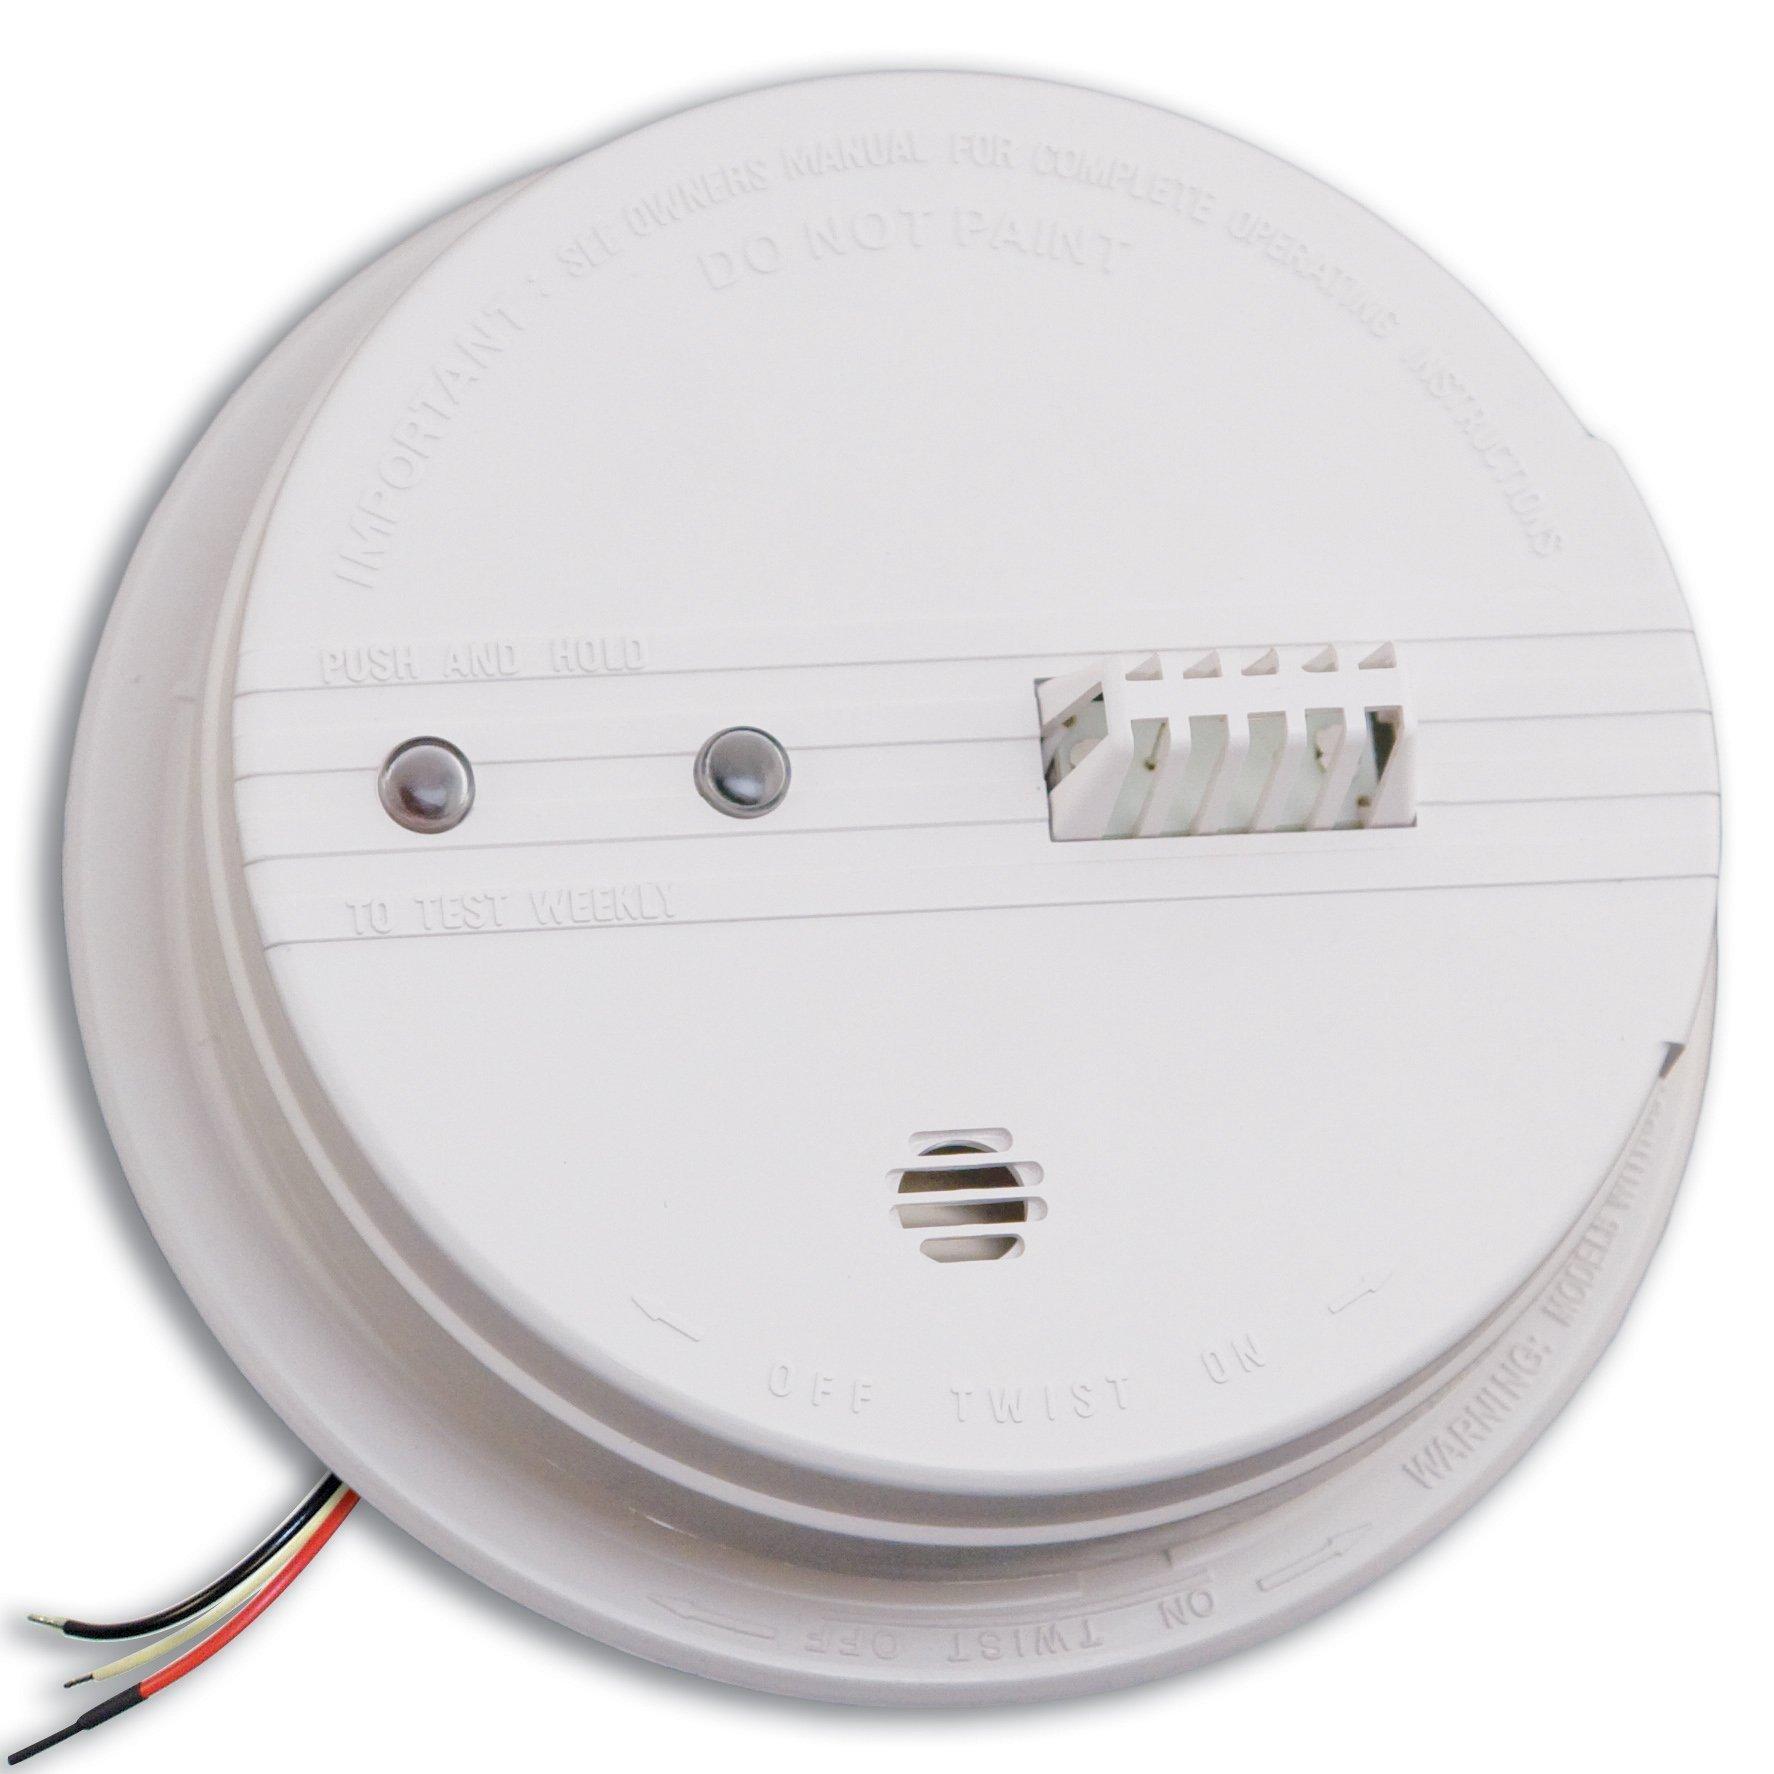 Kidde HD135F Fyrnetics Hardwire Heat Detector with Battery Backup